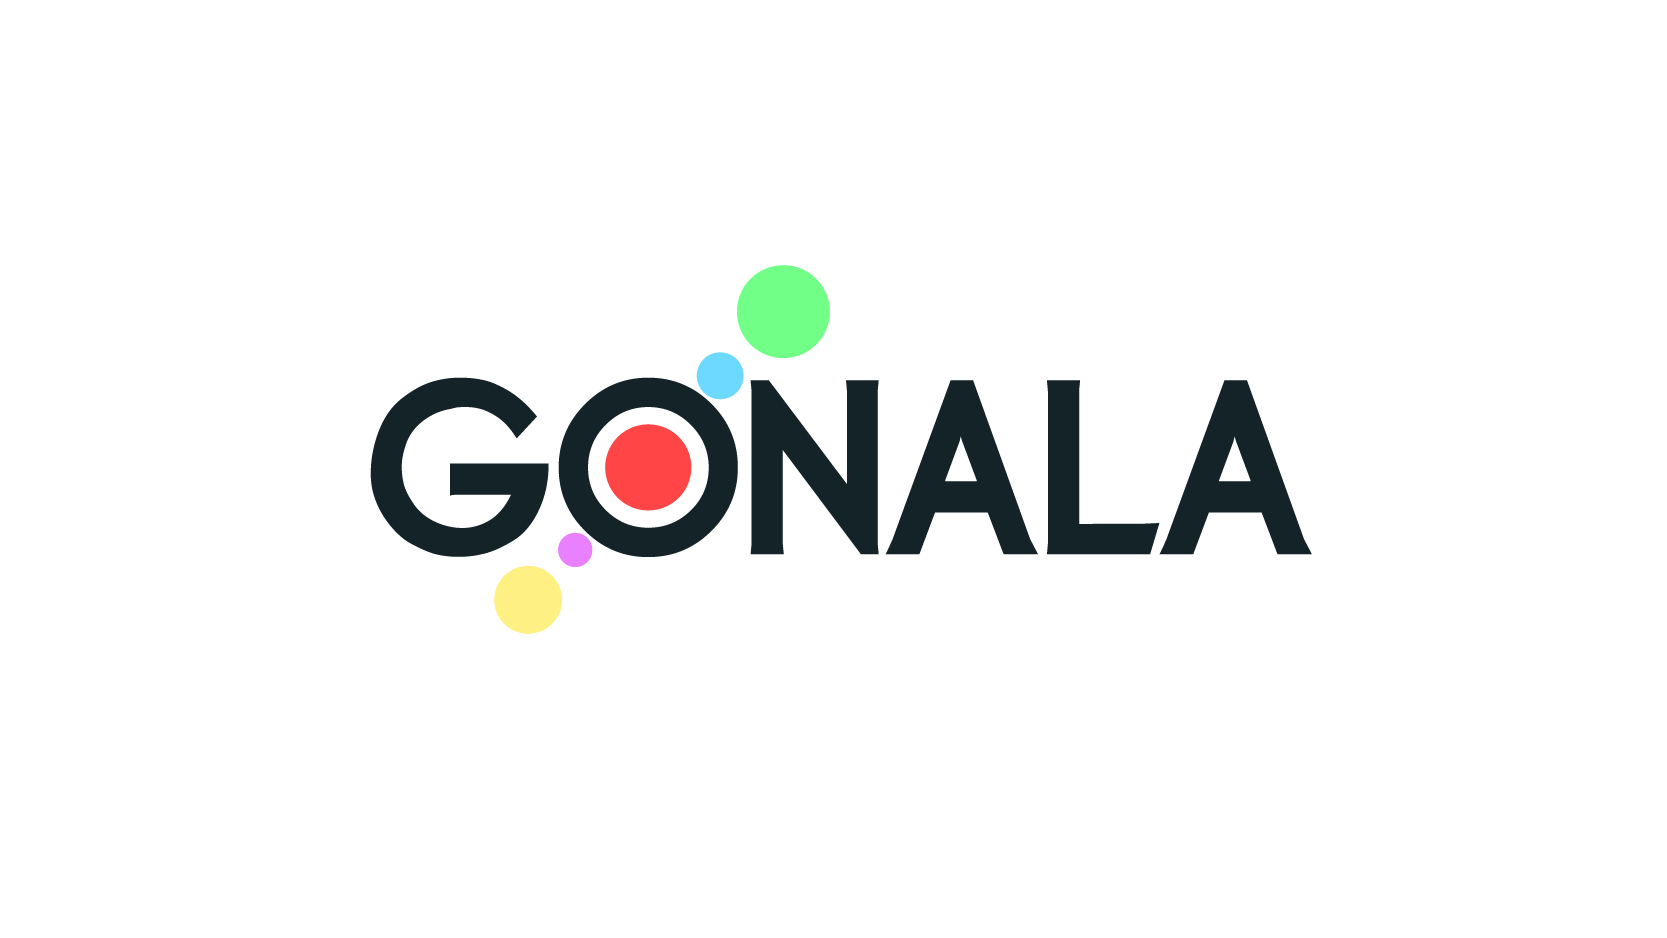 Gonala.com